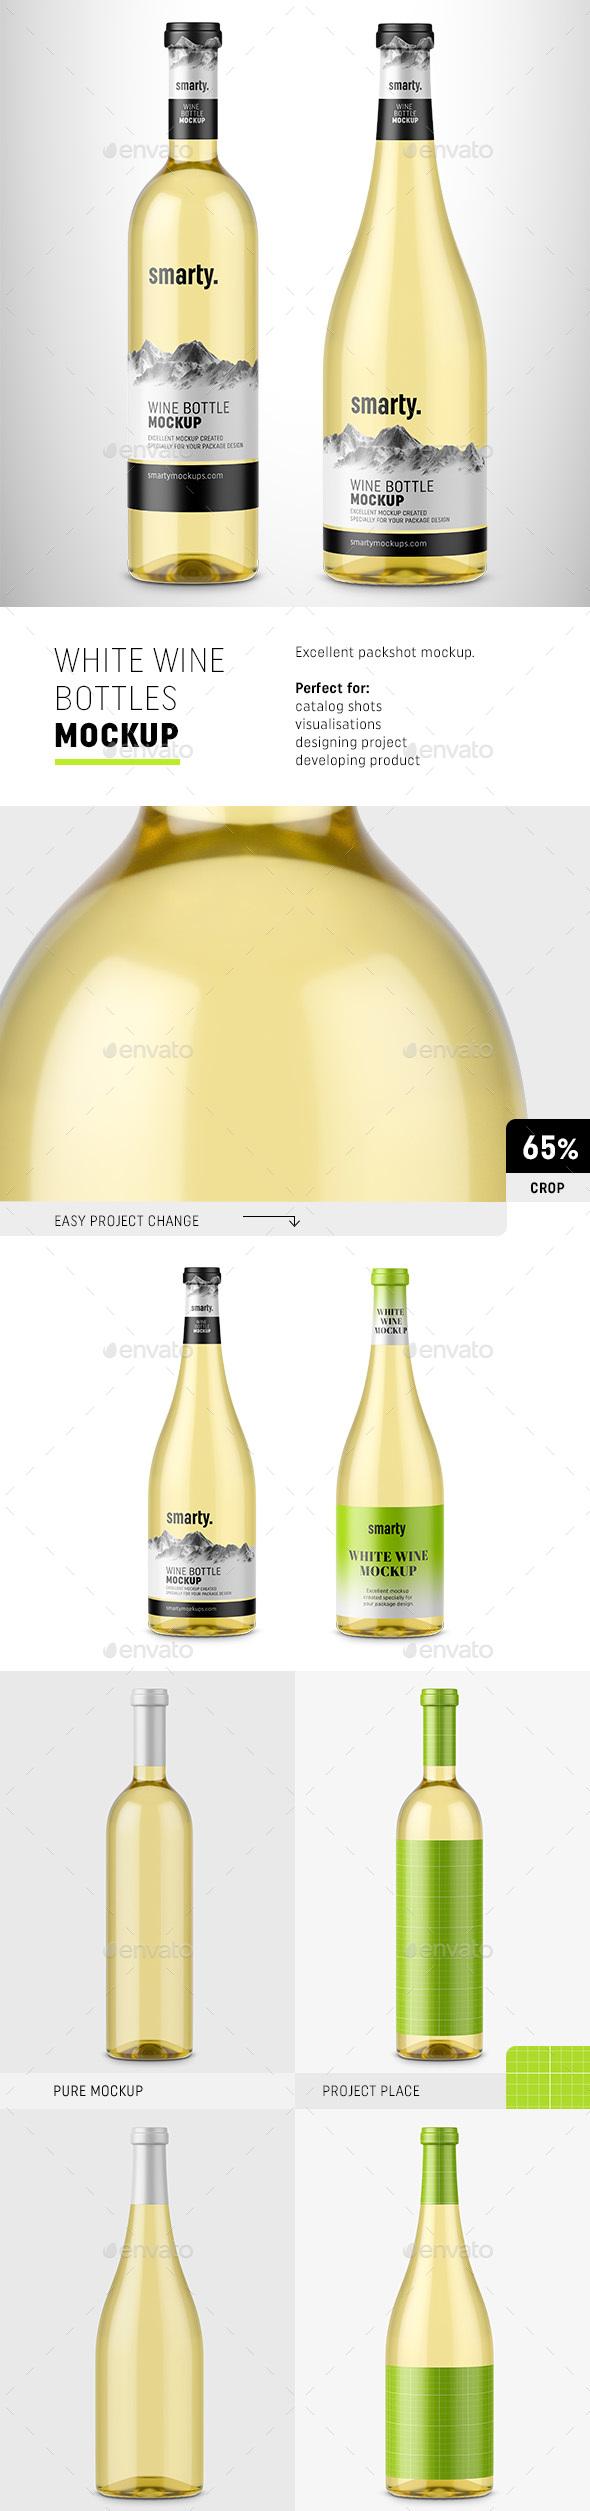 White Wine Bottles Mockup - Food and Drink Packaging